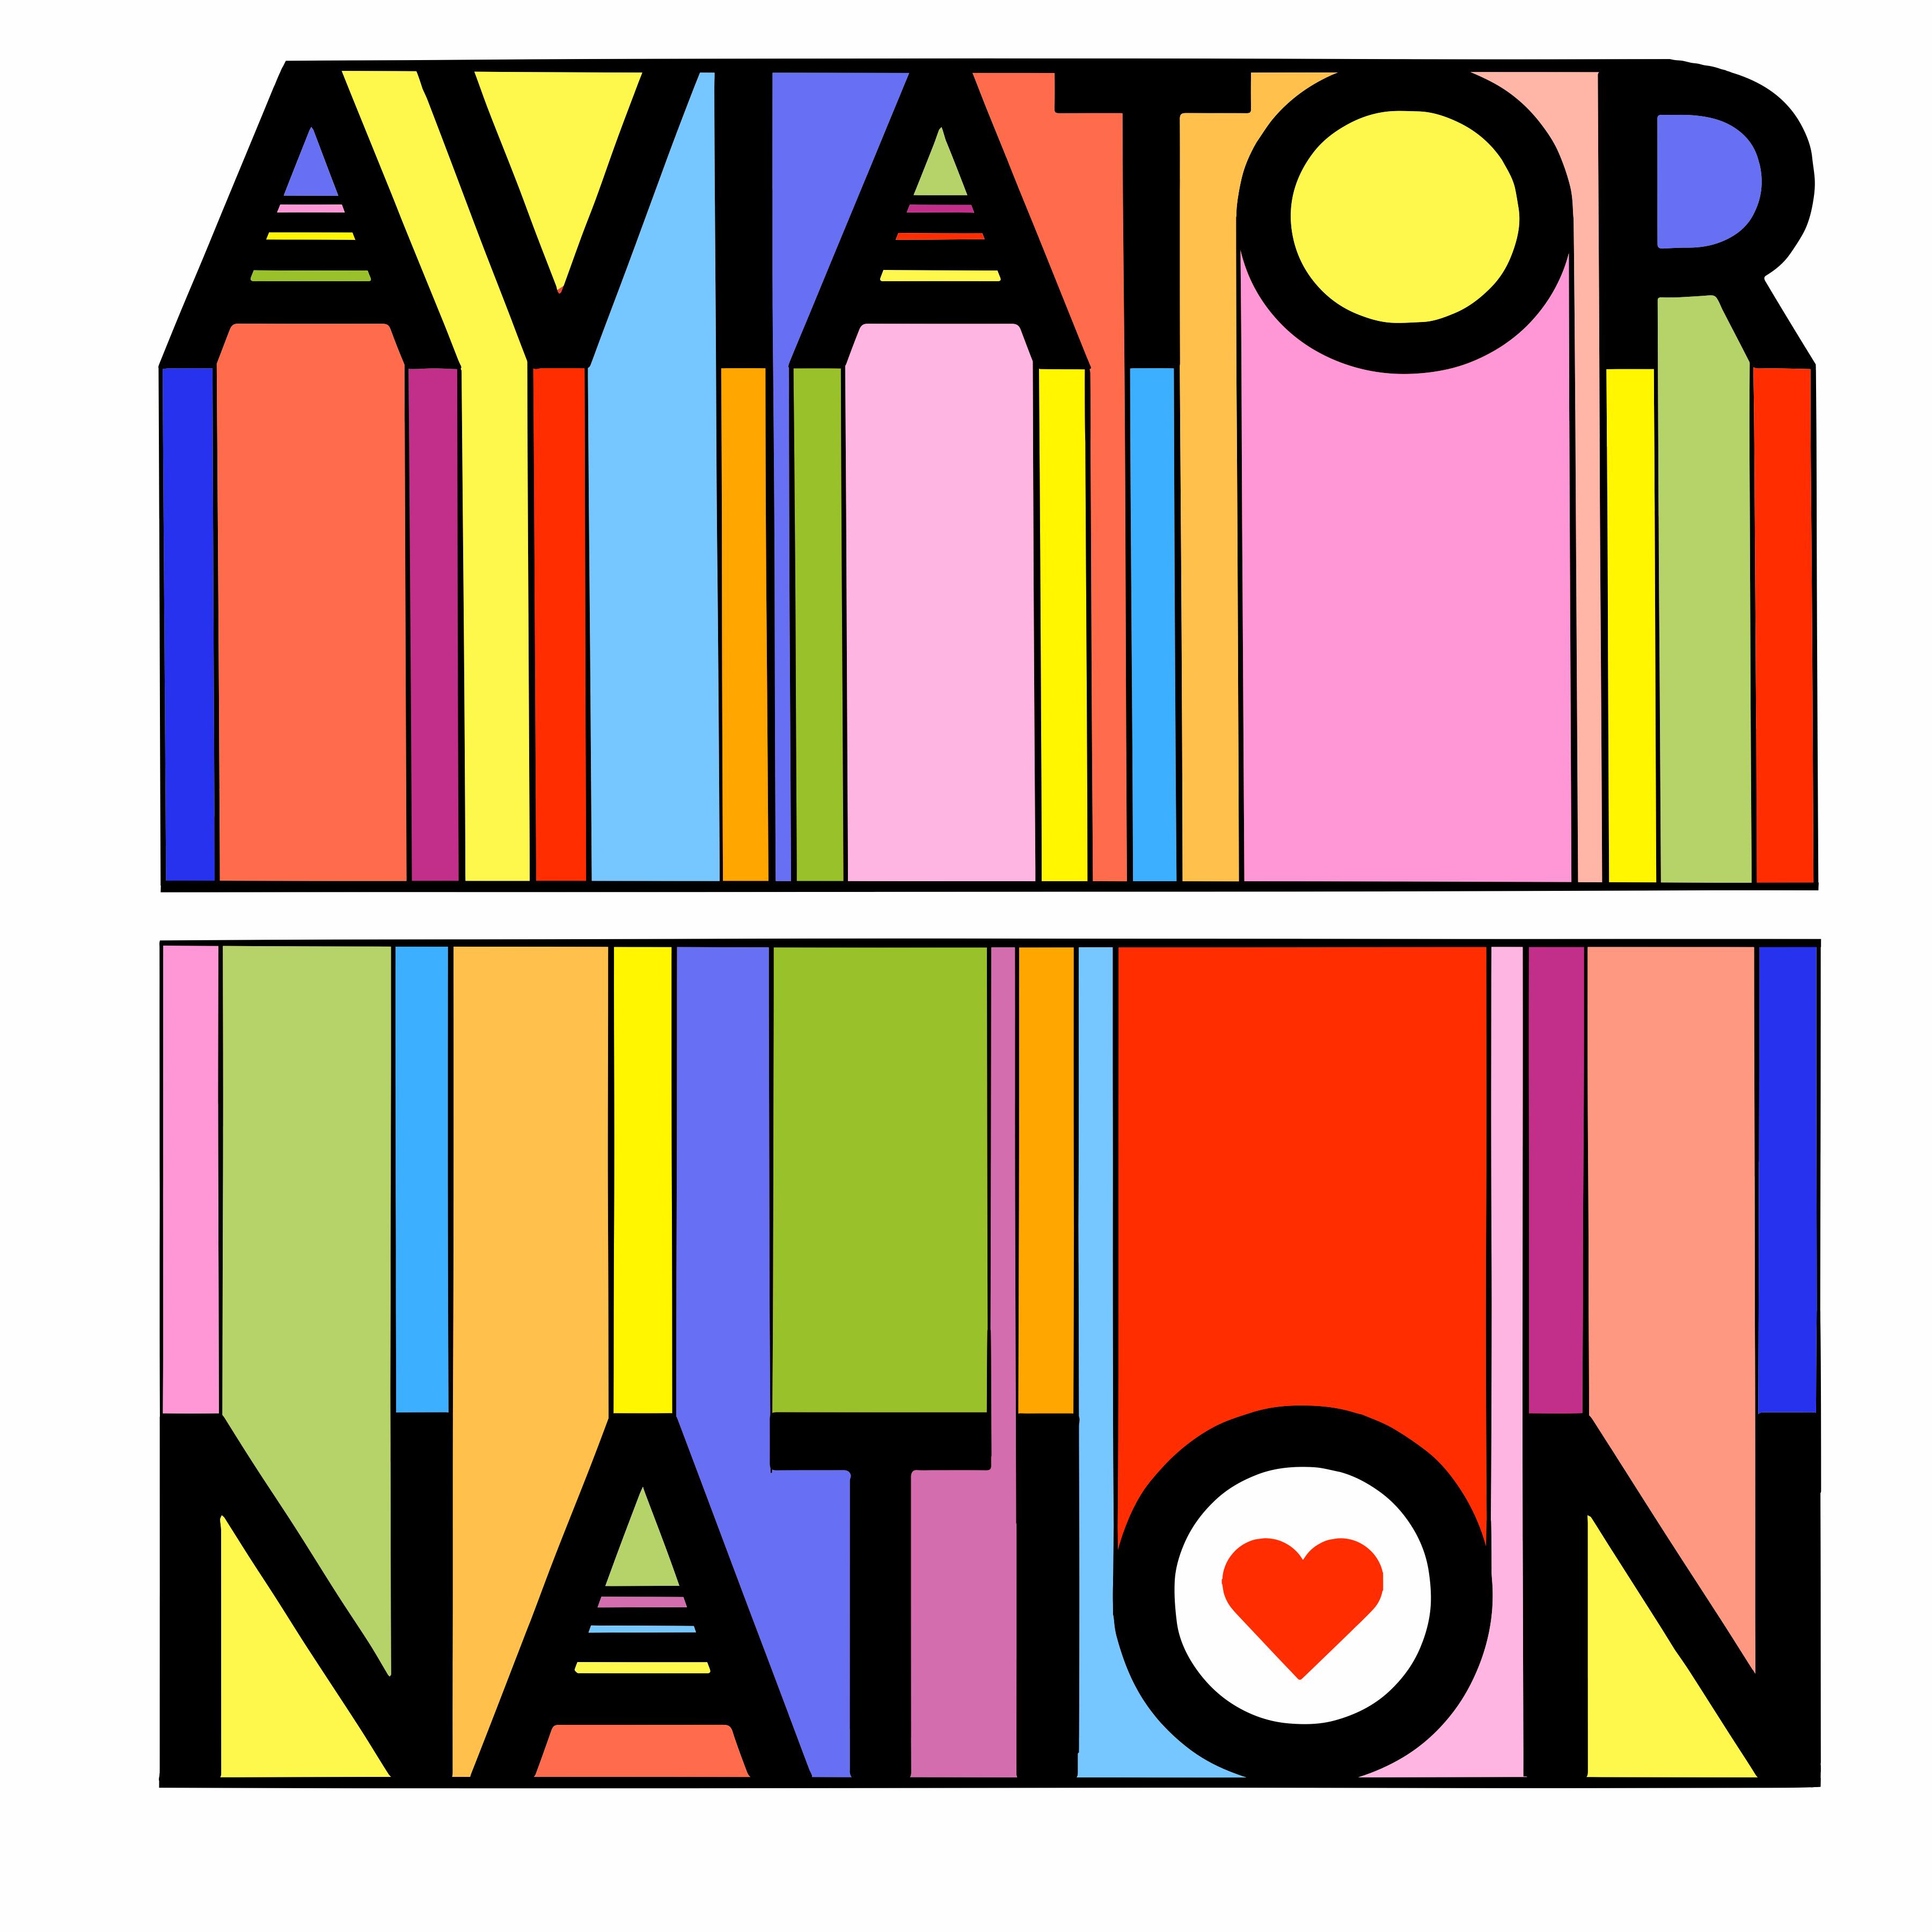 Aviator Nation Idea 3